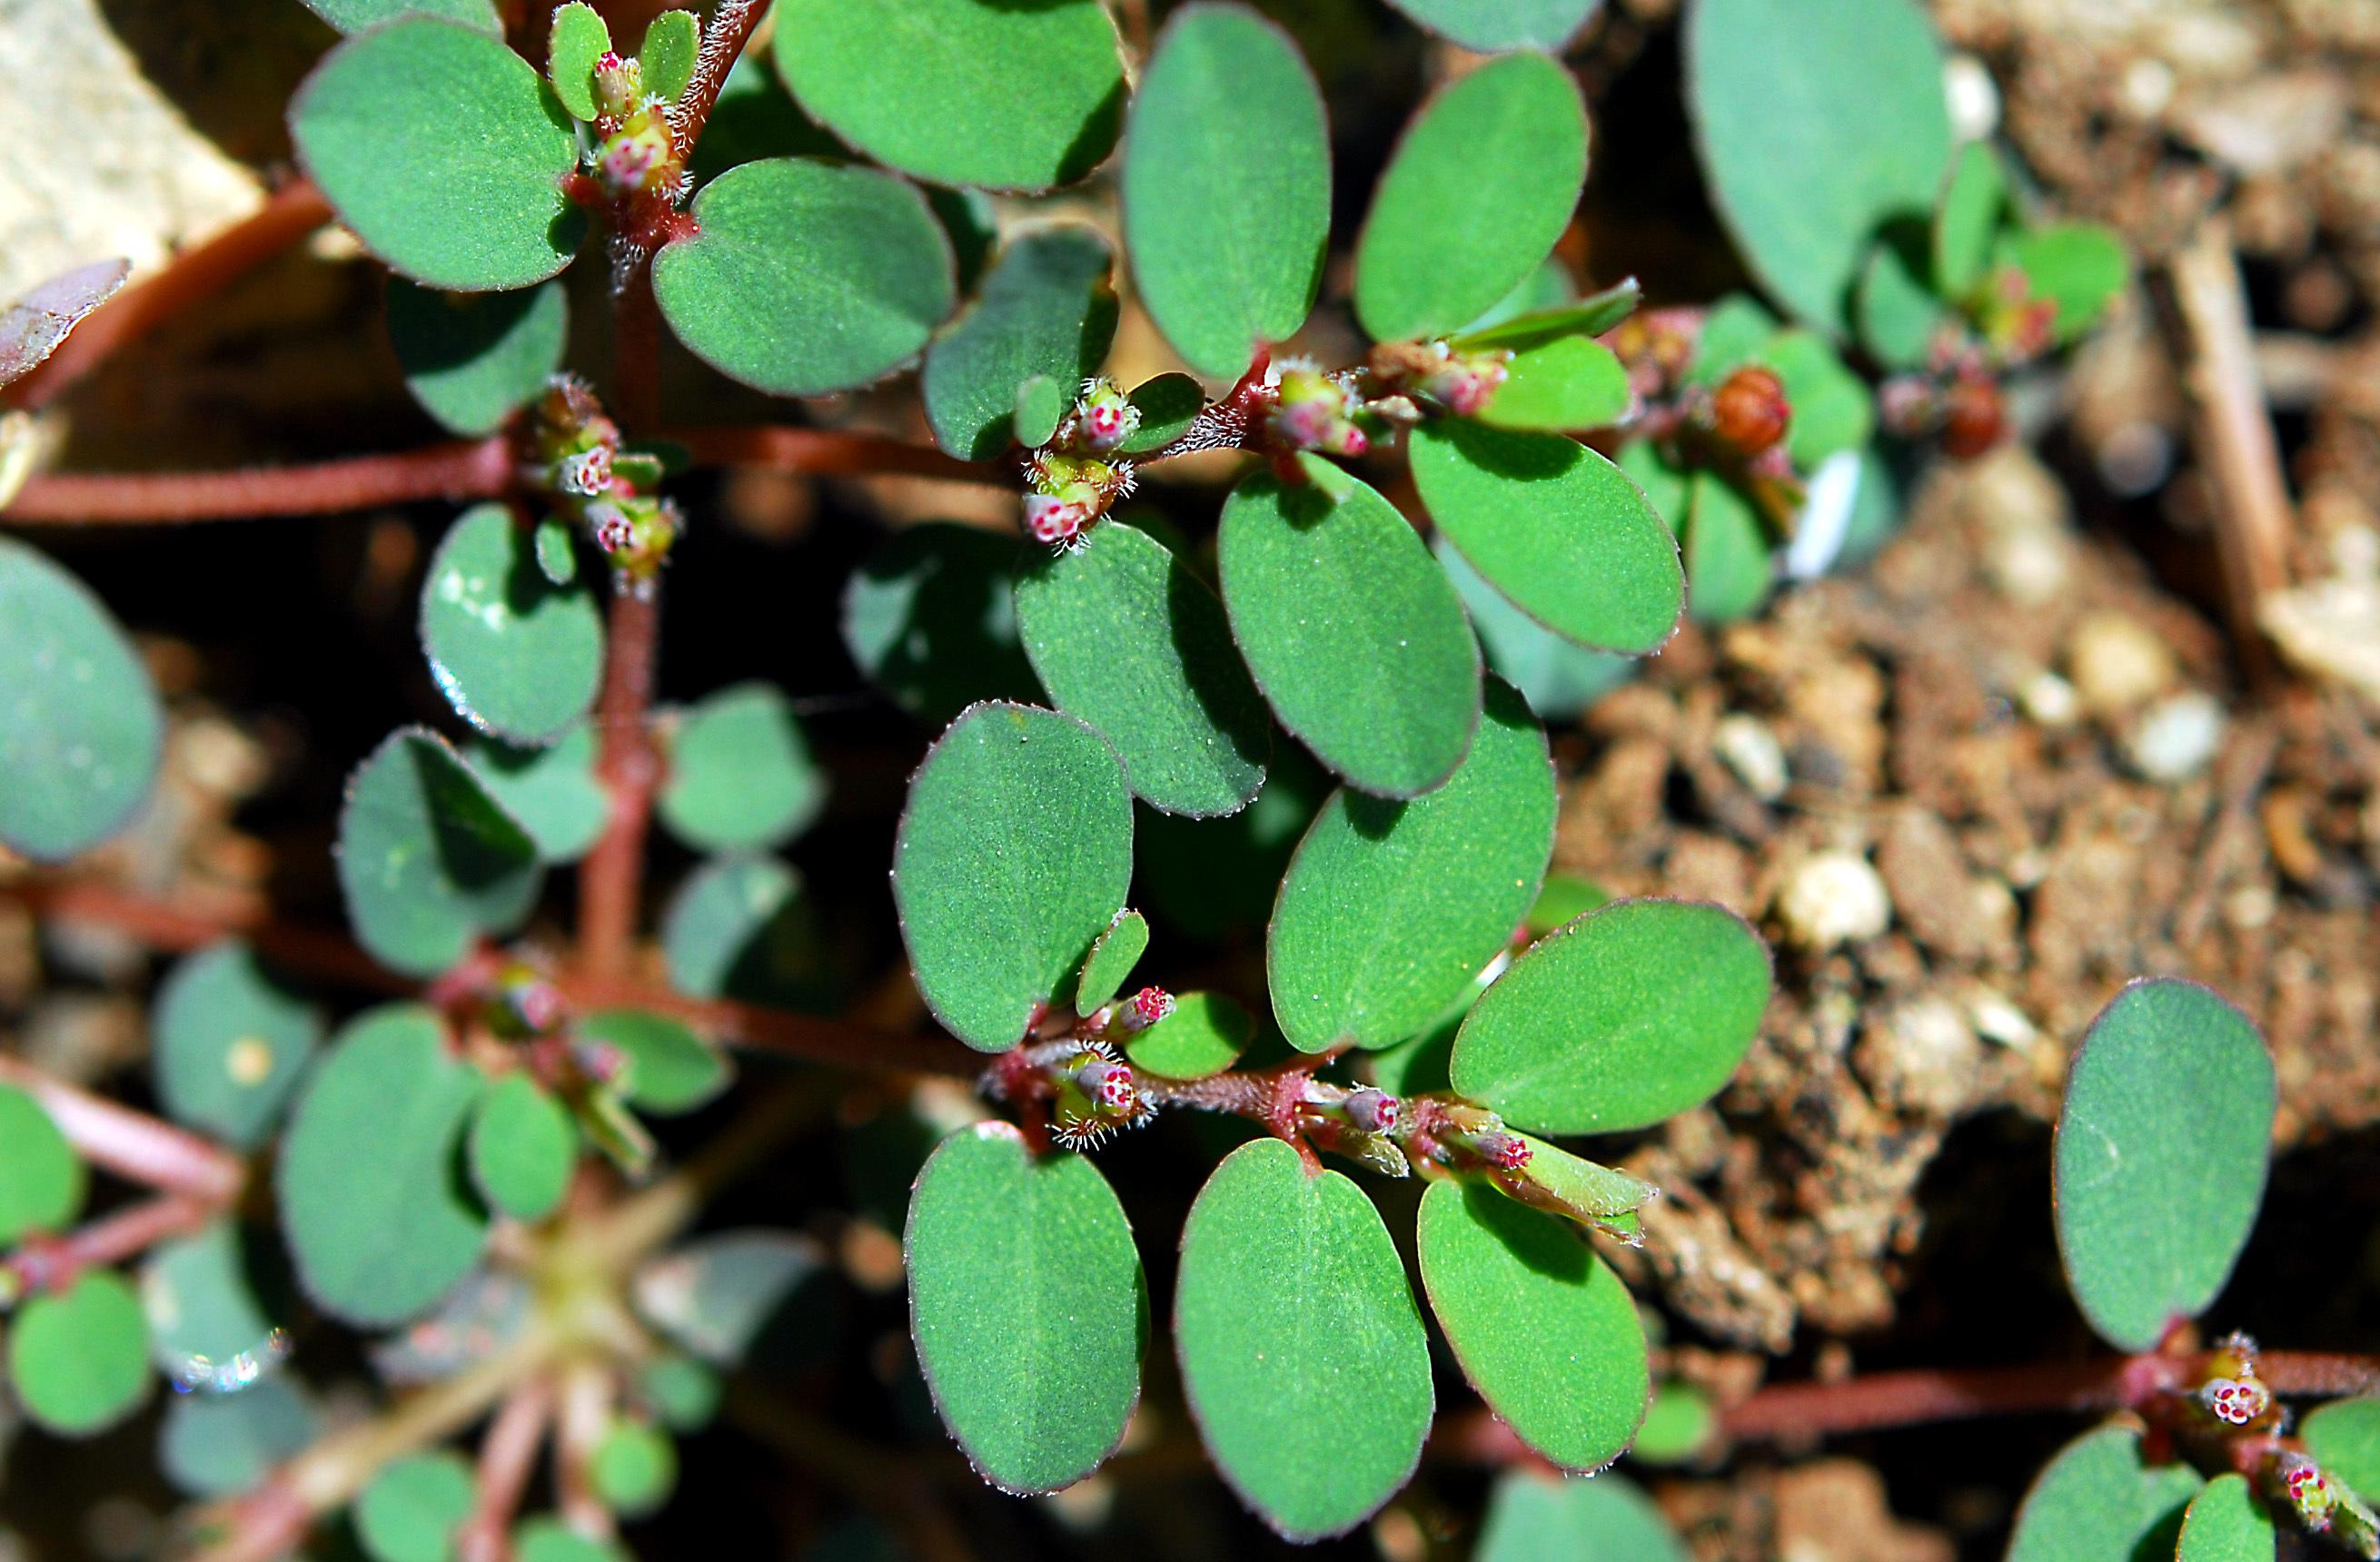 https://pictures.bgbm.org/digilib/Scaler?fn=Cyprus/Euphorbia_prostrata_B1.jpg&mo=file